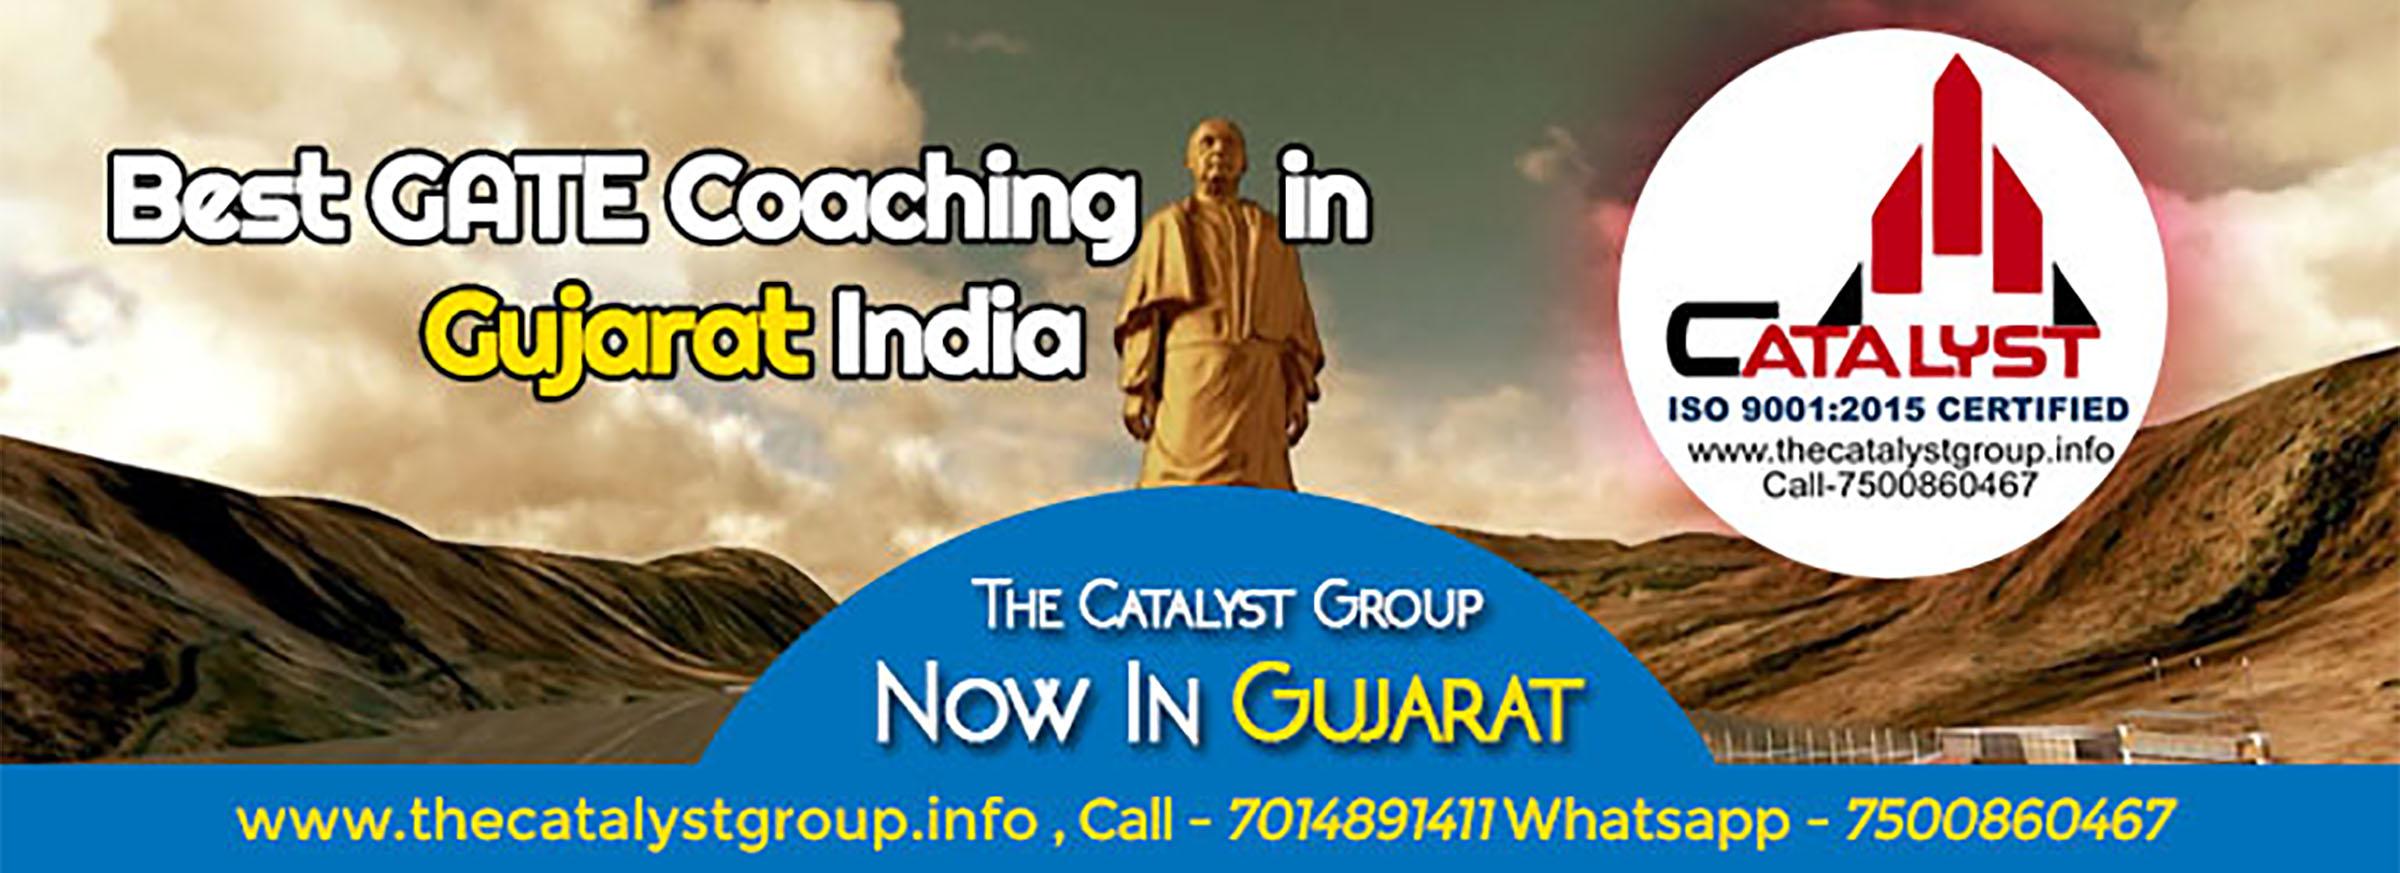 best-gate-coaching-in-Gujarat-b